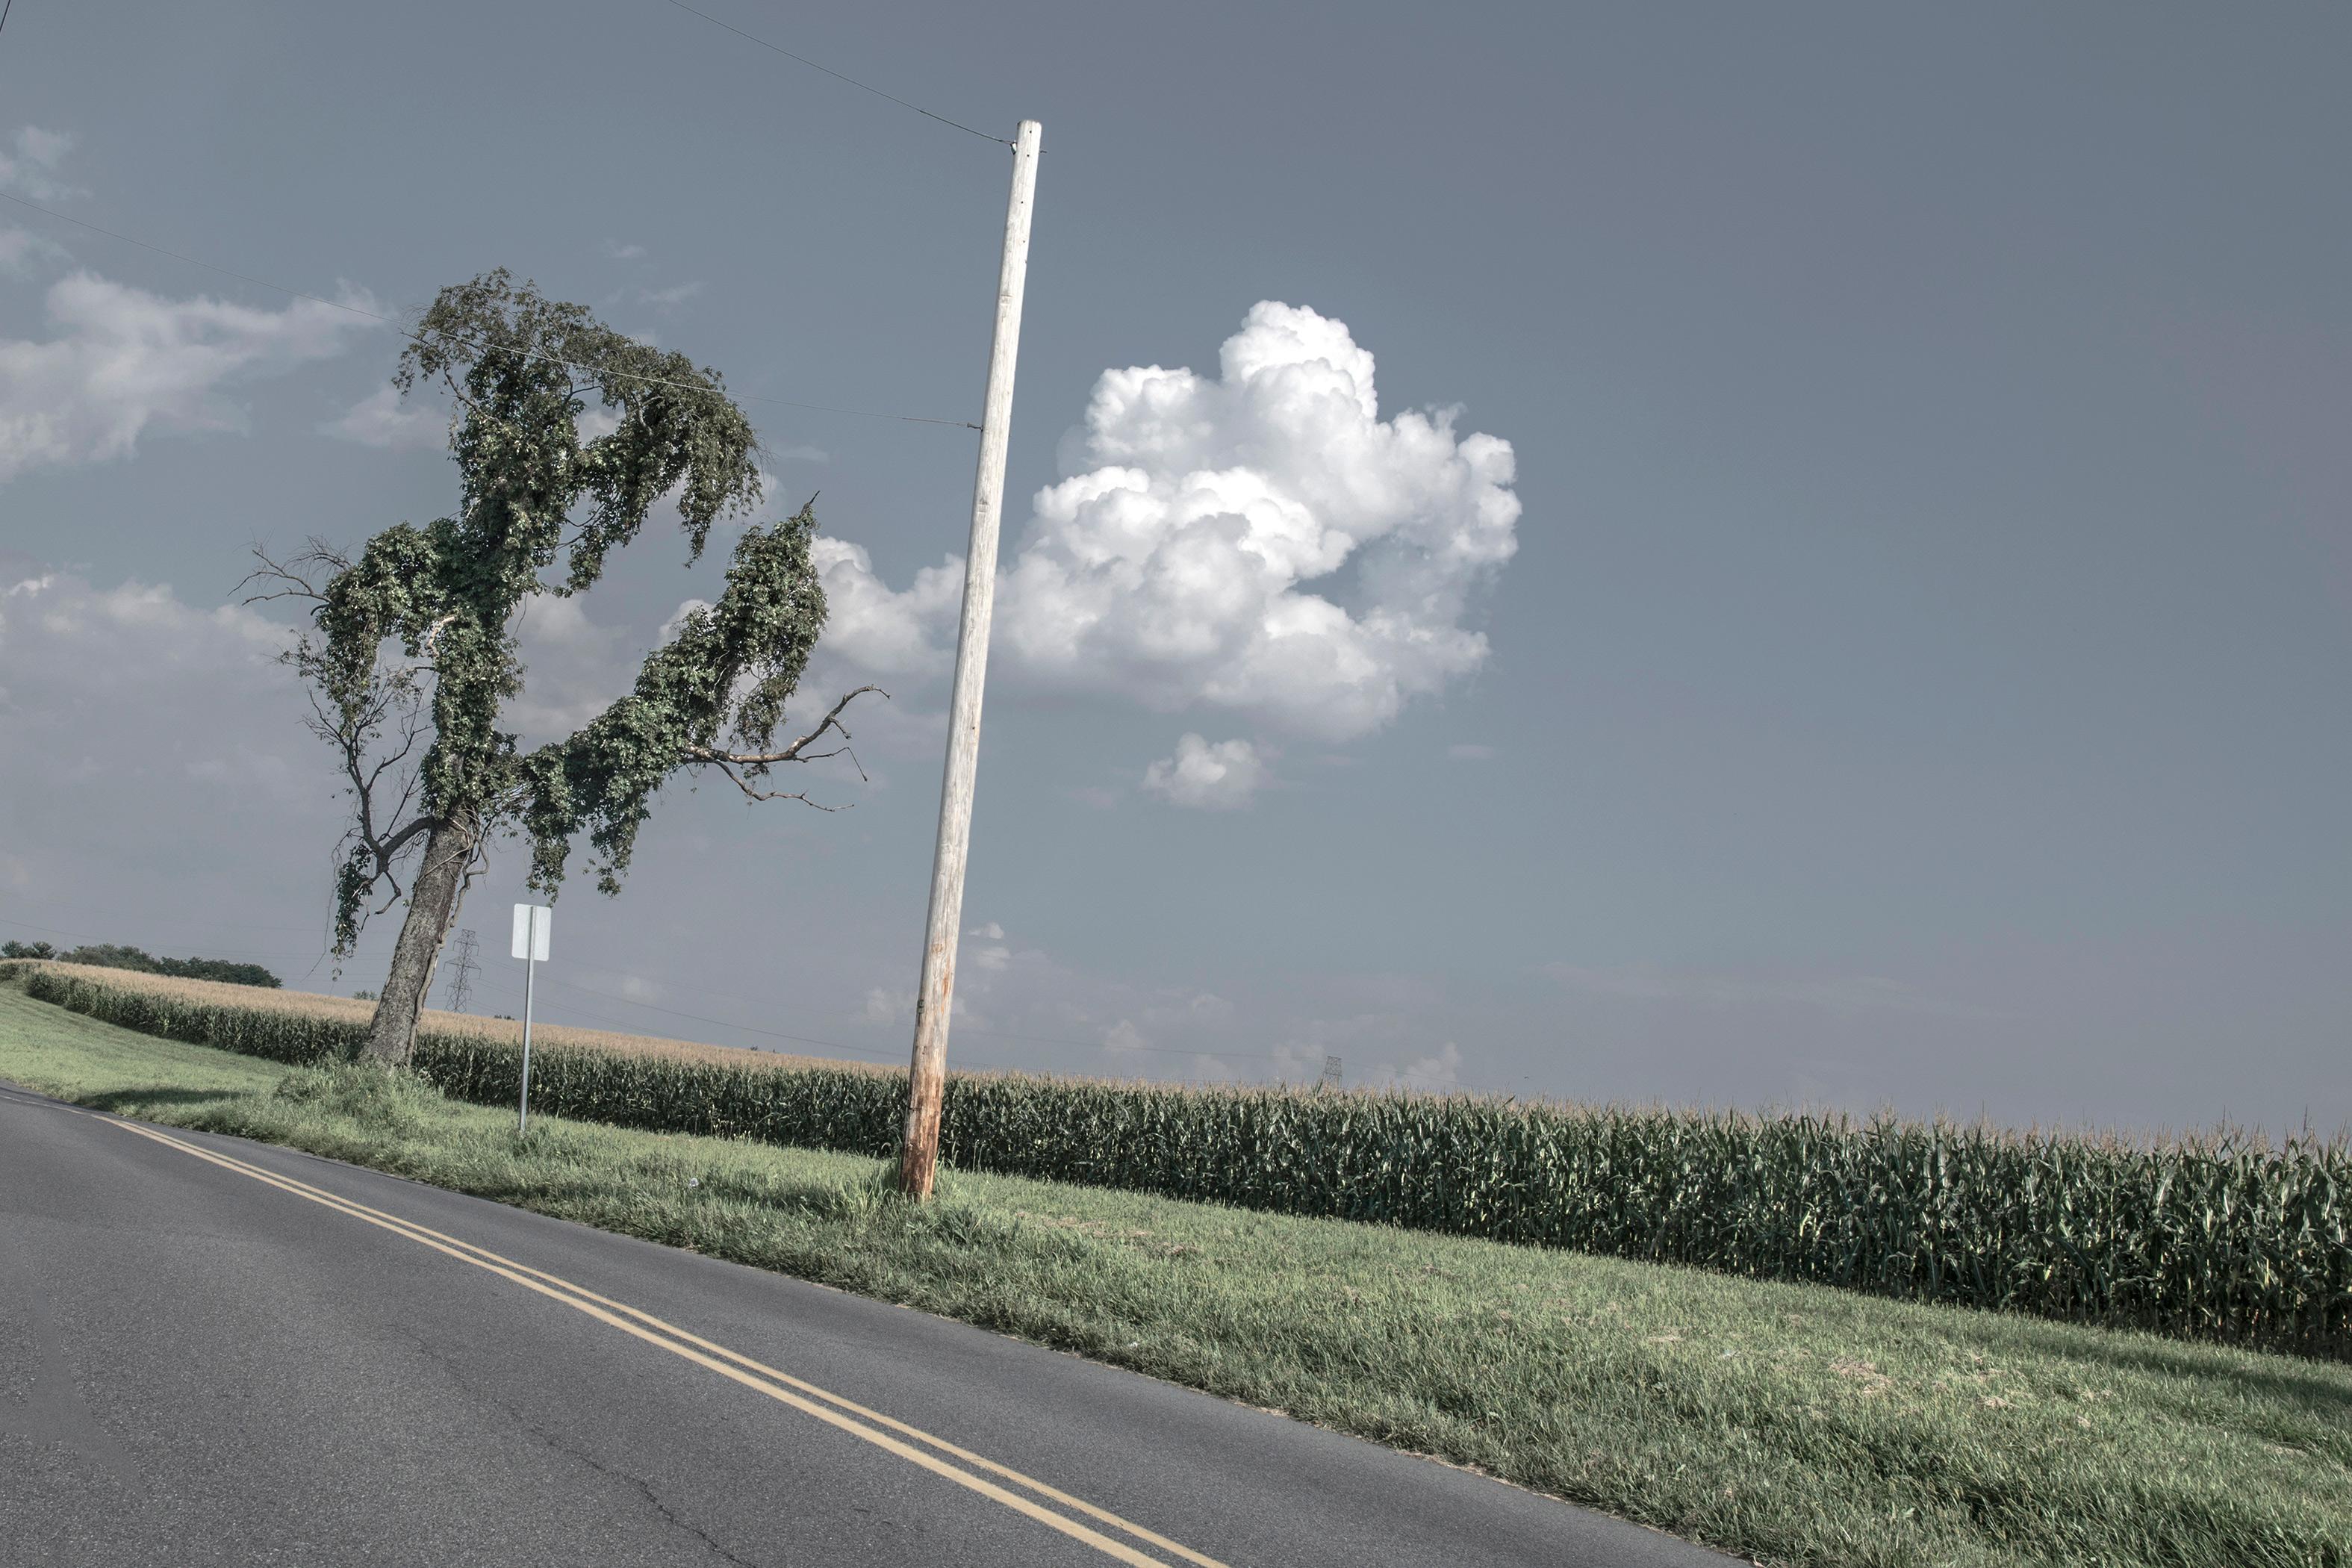 A cloud on Newburgh Road in Easton Pennsylvania